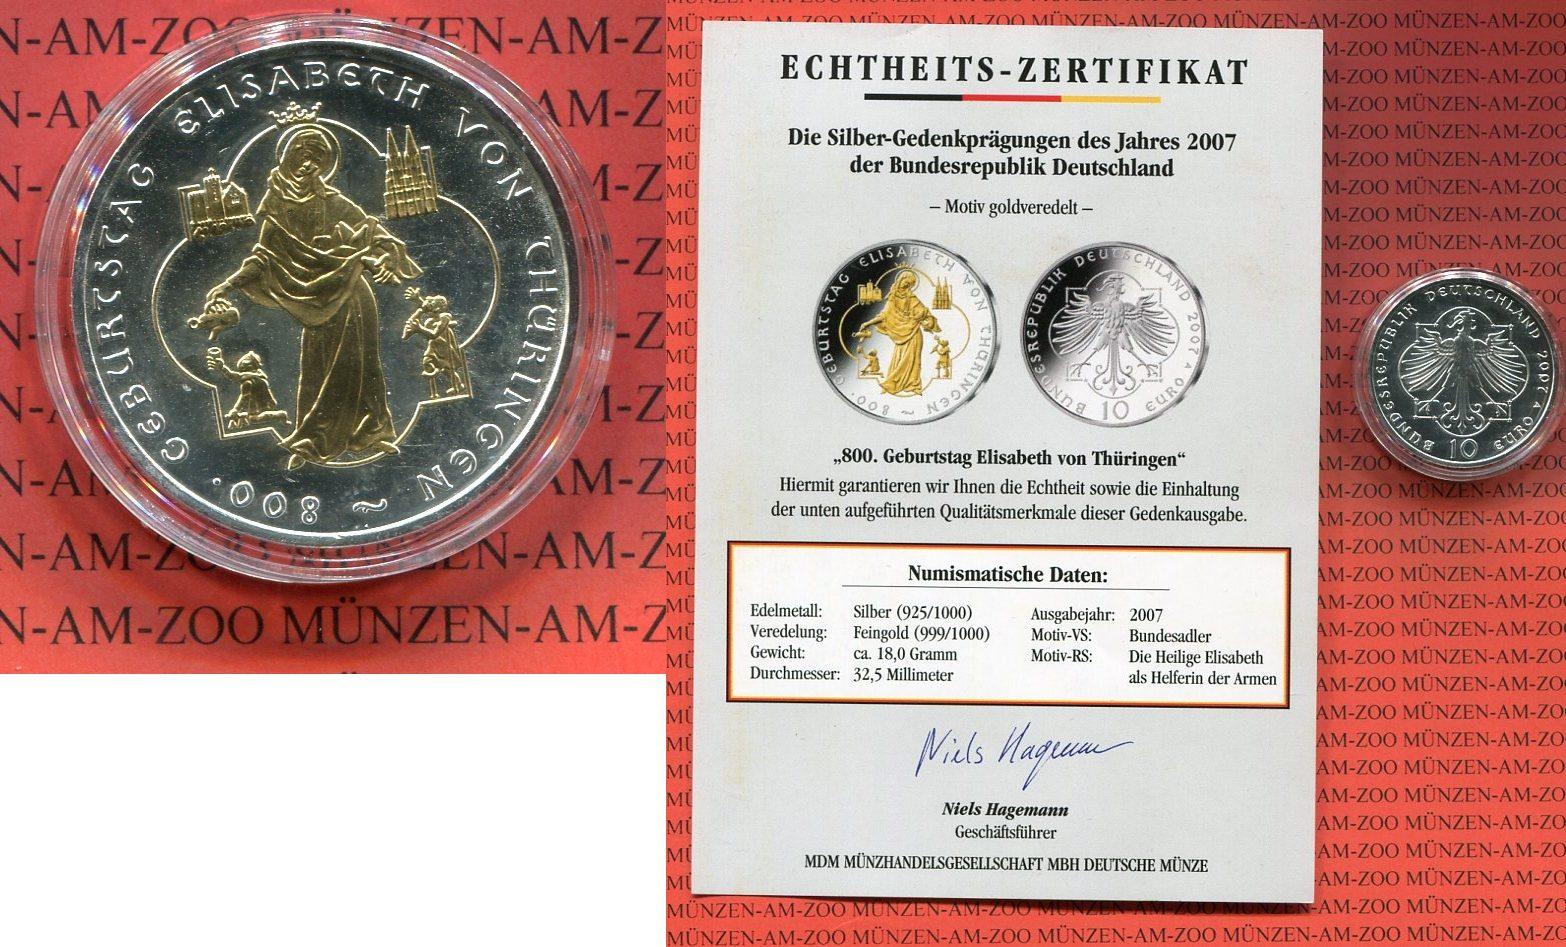 10 Euro Silbermünze Mit Goldapplikation 2007 Bundesrepublik